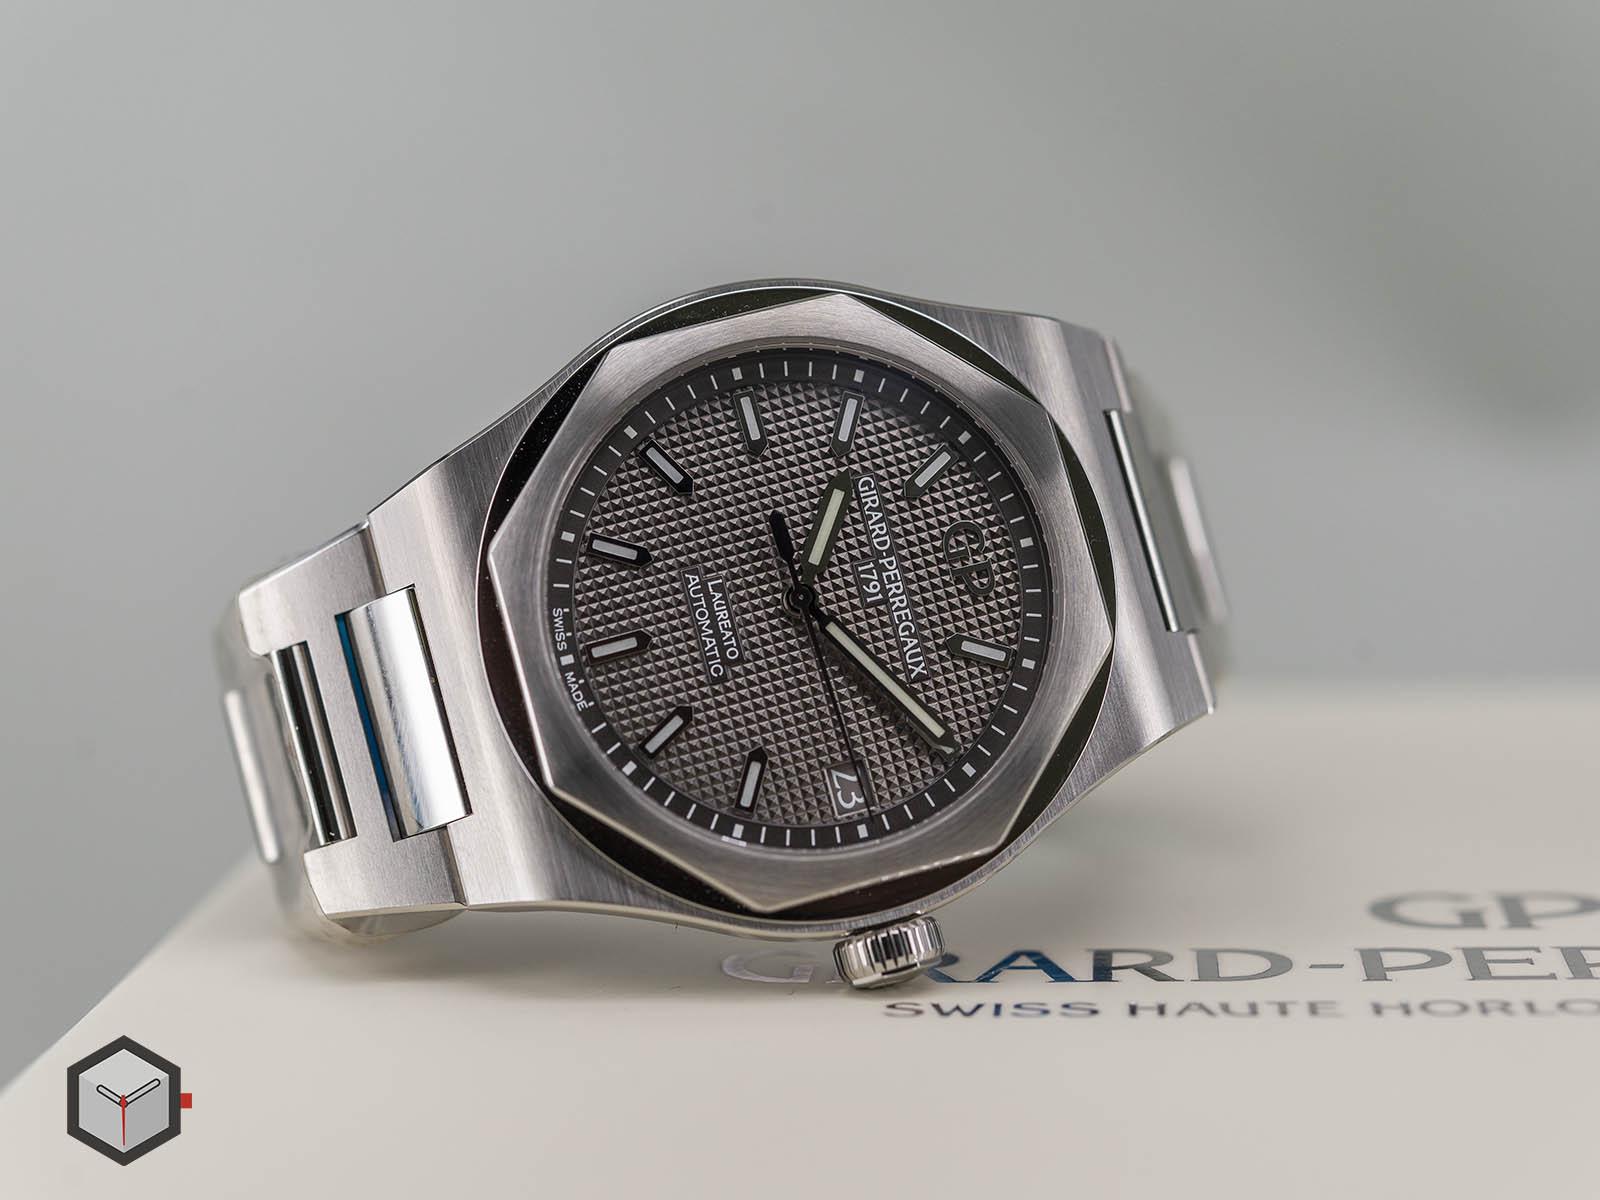 girard-perregaux-laureato-chronograph-42-mm-8.jpg